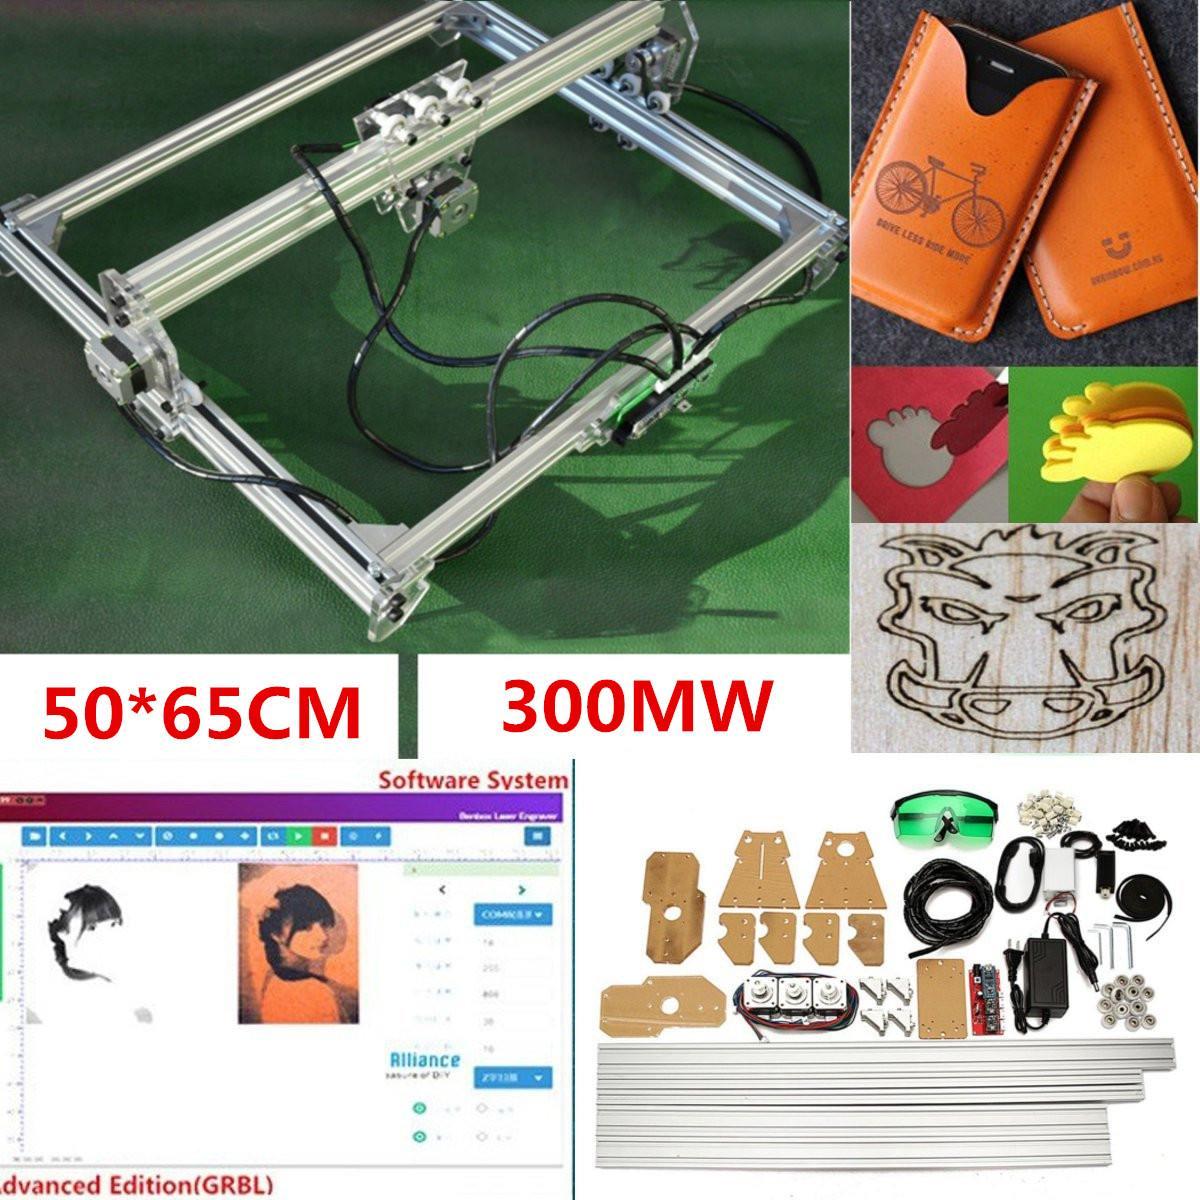 Mini 50*65 cm 405nm 300 mw Blu del Laser di CNC Macchina Per Incidere DC 12 v FAI DA TE Incisore Desktop di Legno router/Cutter/Stampante + Occhiali di Protezione Laser